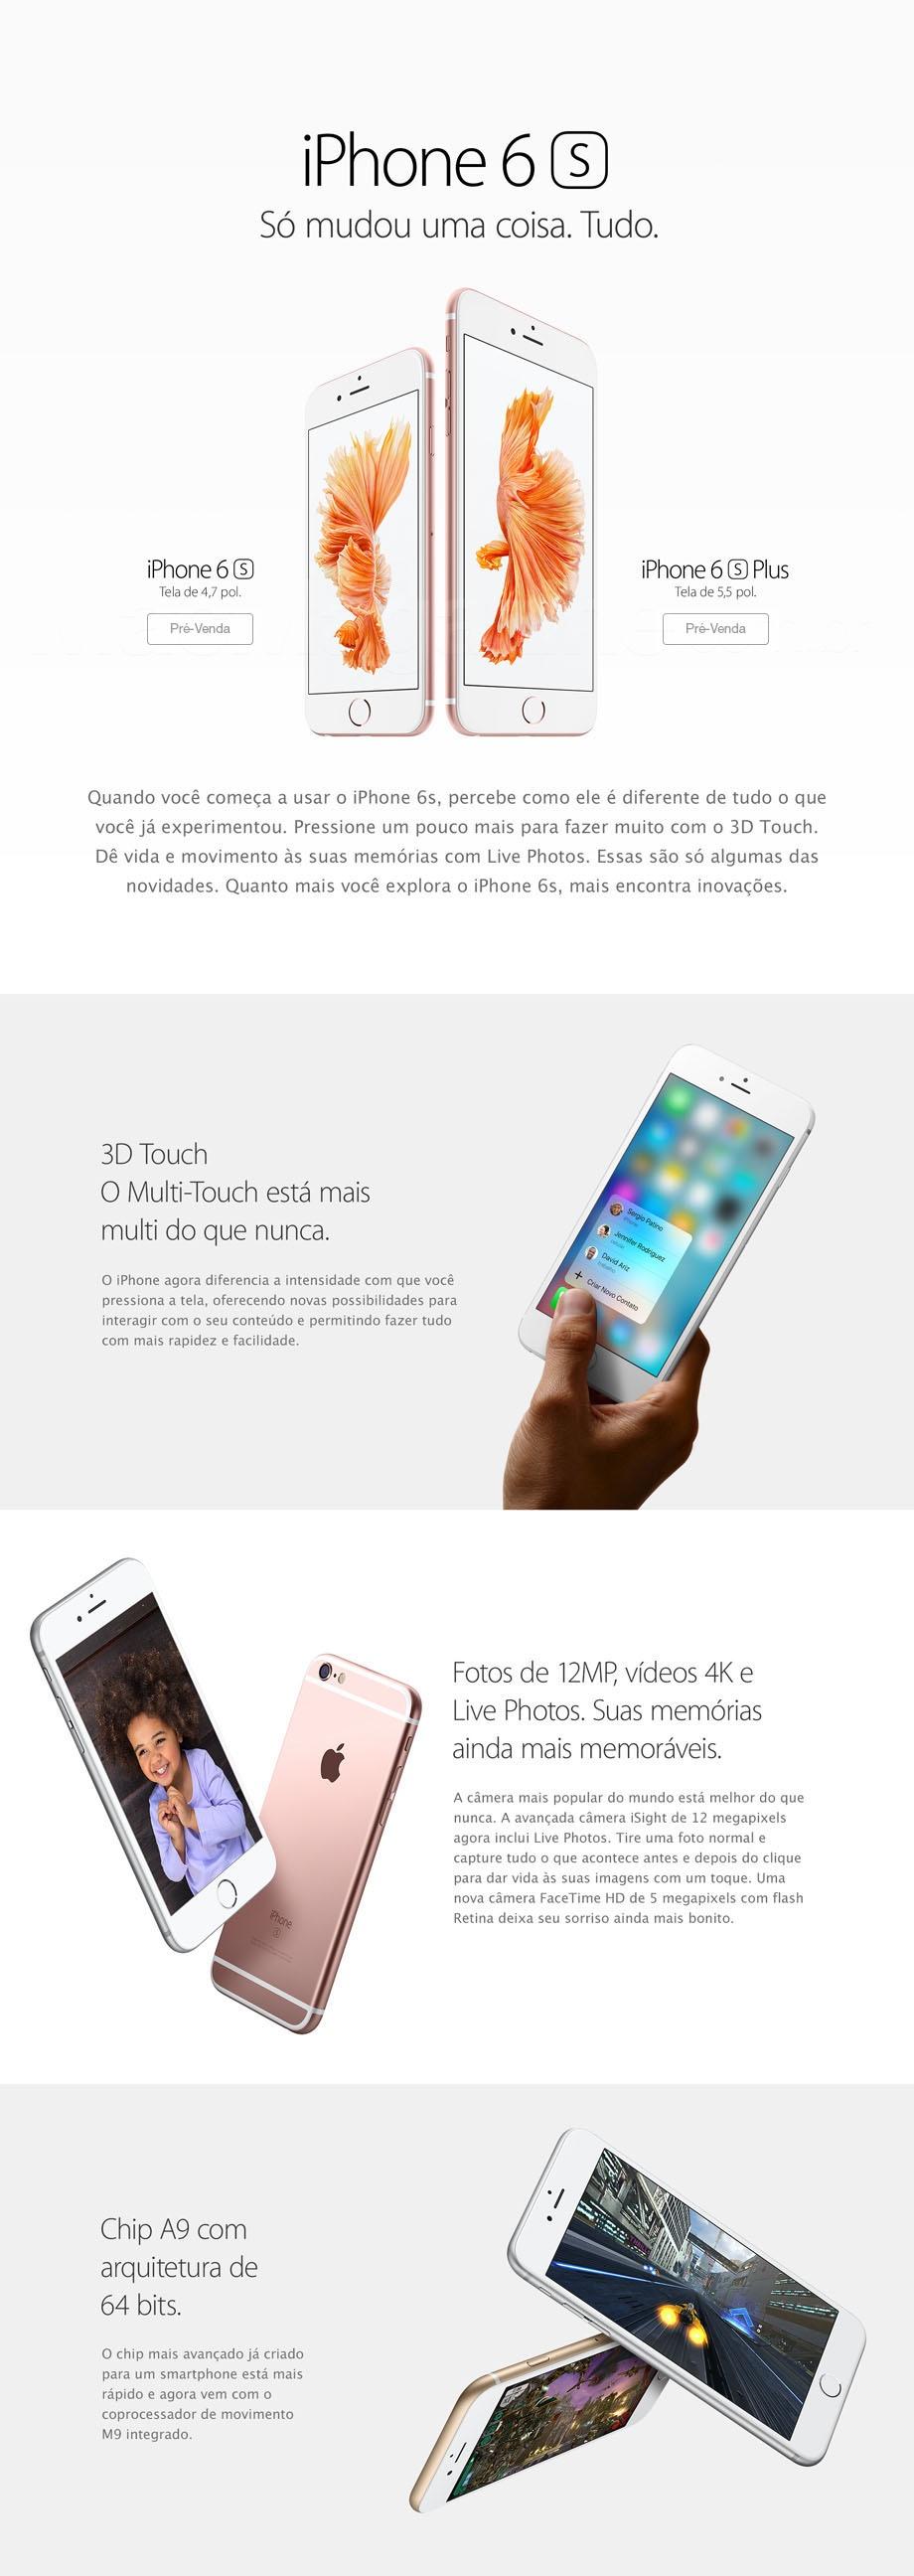 Infográfico do iPhone 6s